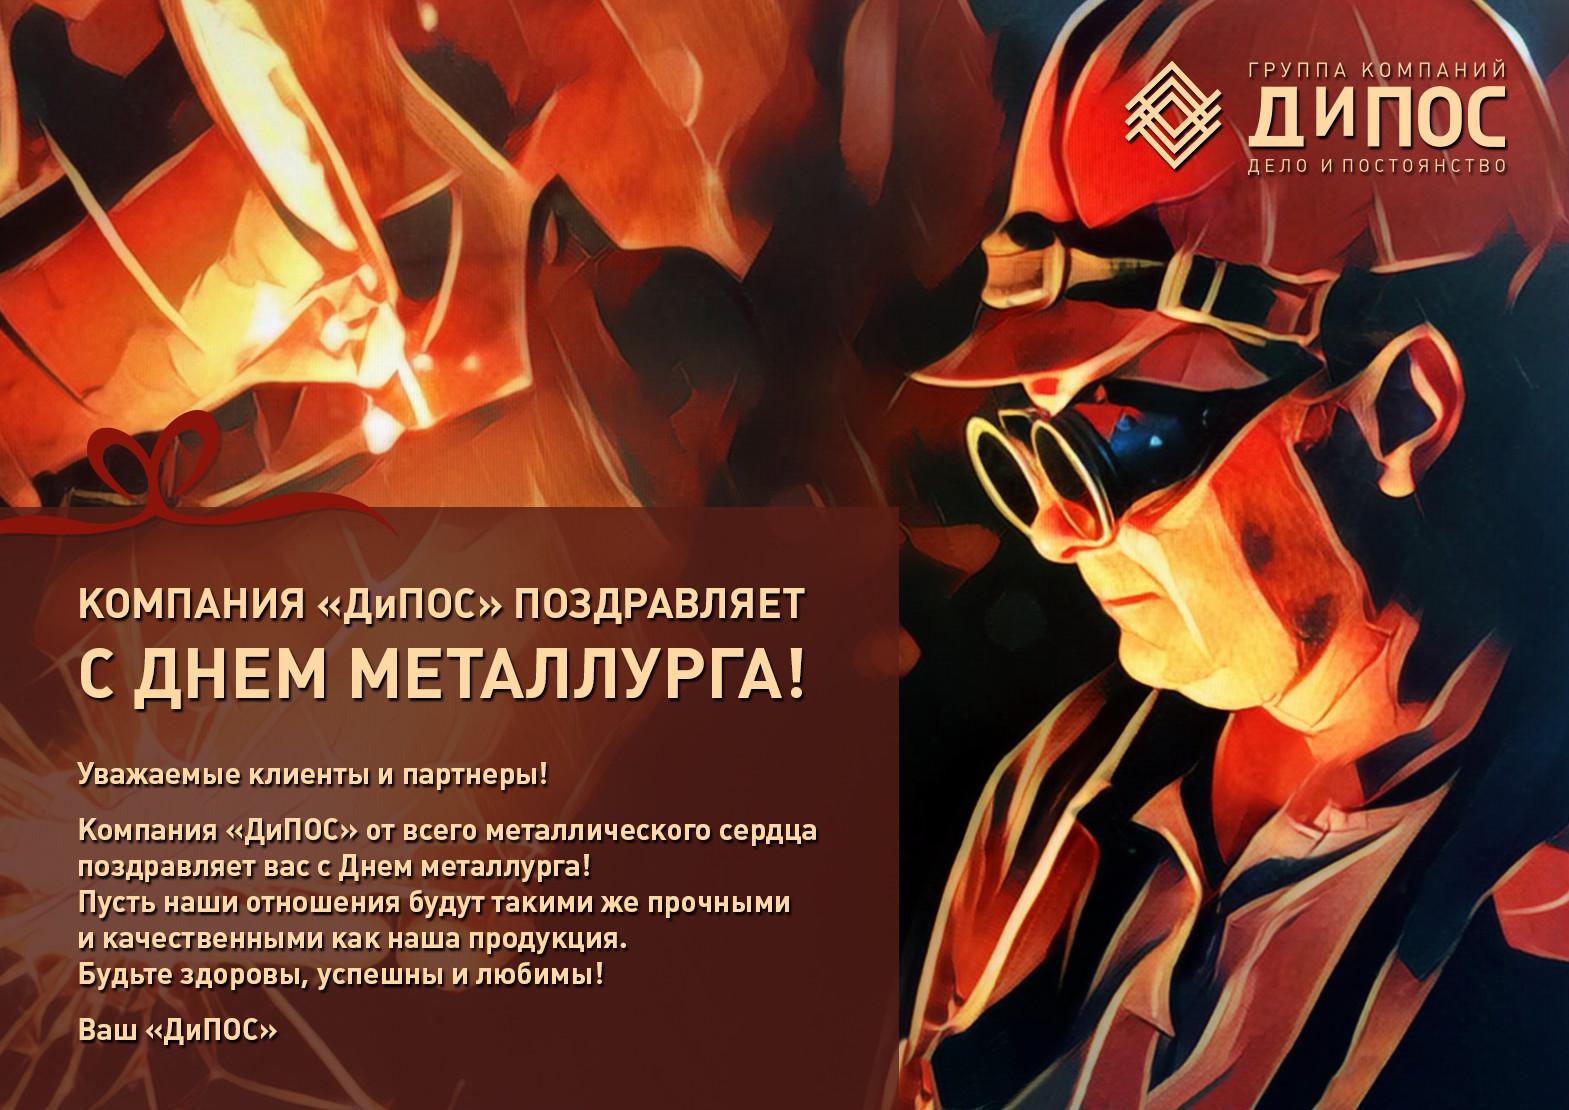 С днем металлурга открытка корпоративная, крутые наряды